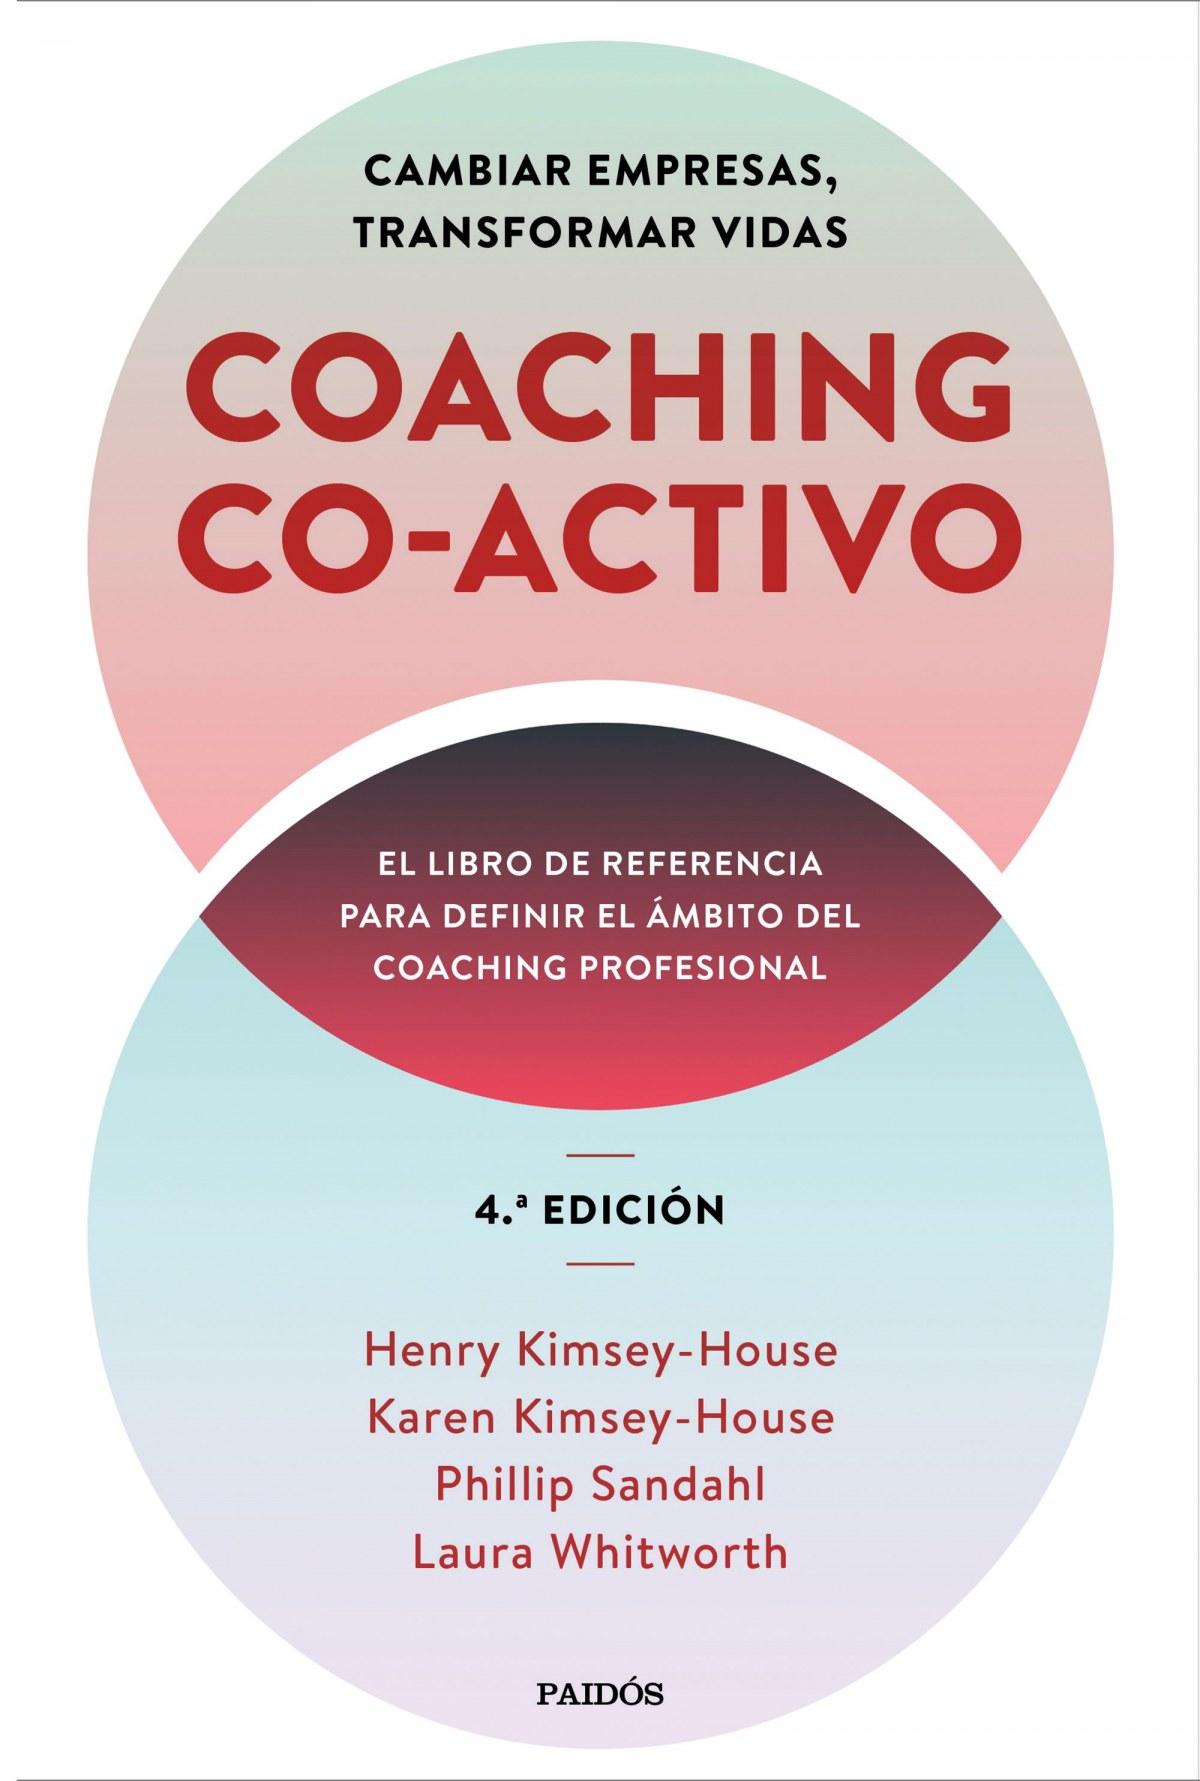 Coaching Co-activo